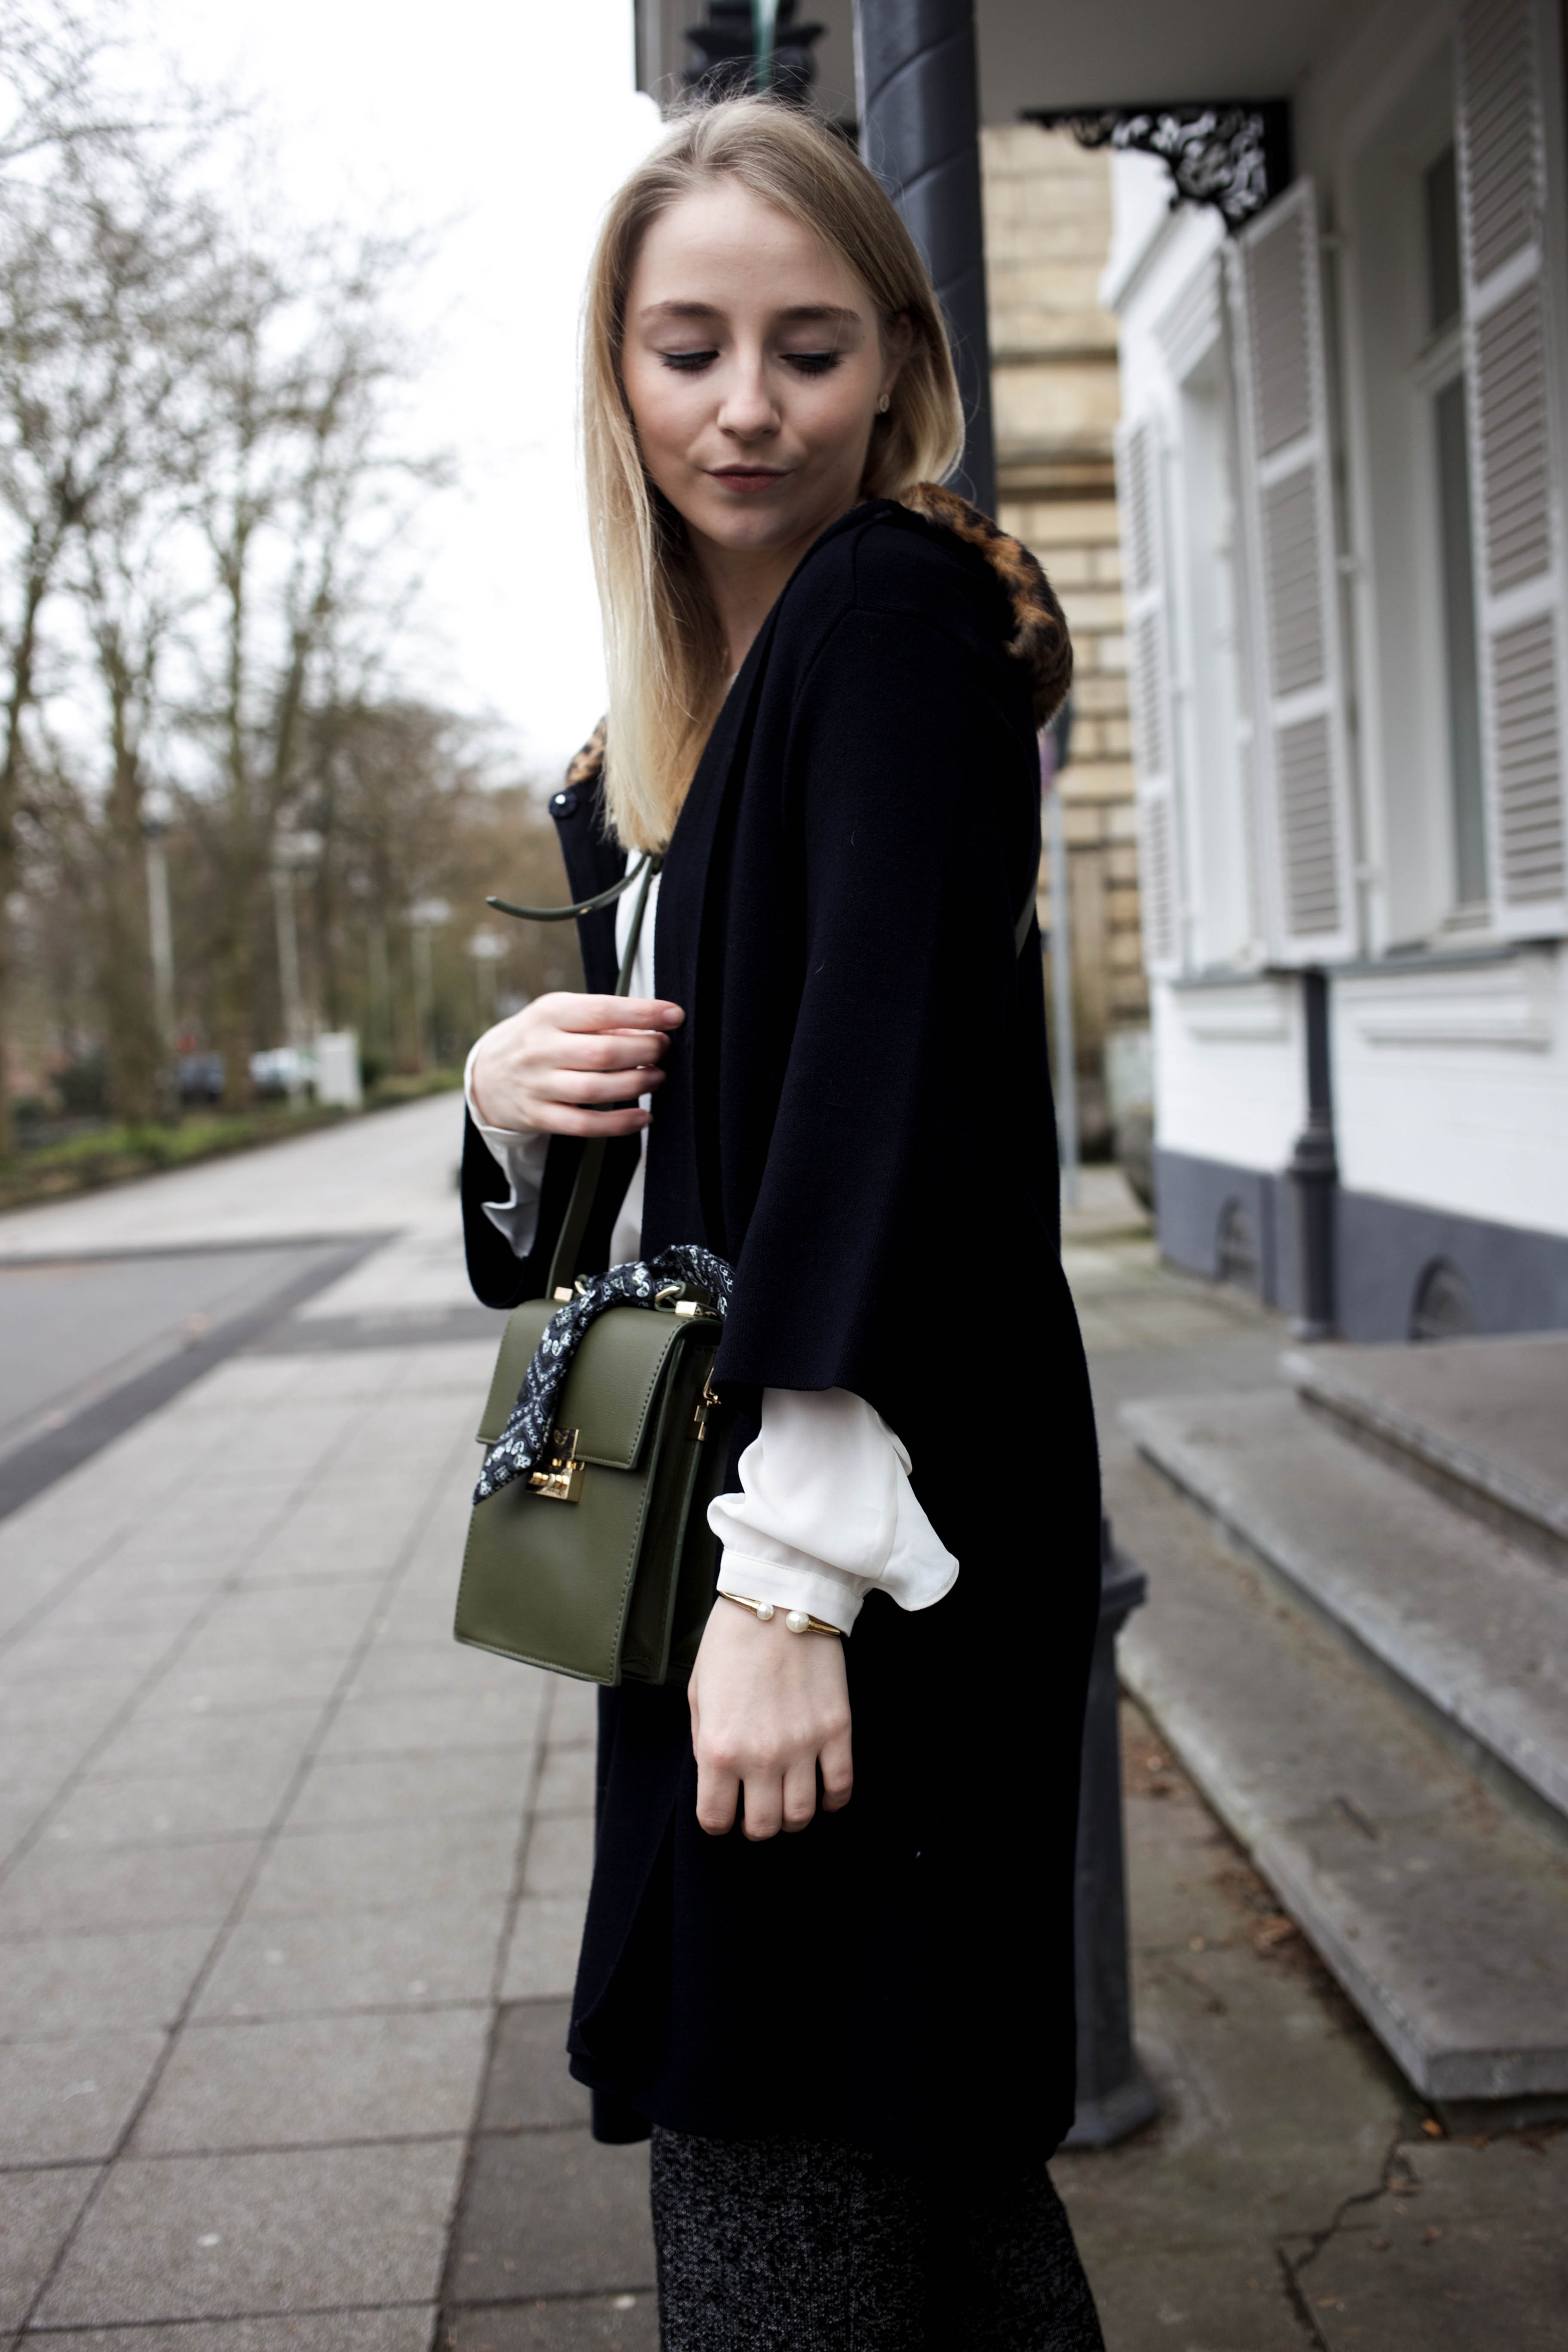 marlenehose-kombinieren-streetstyle-look-modeblog-fashion-blog-cologne-berlin-bonn_0030